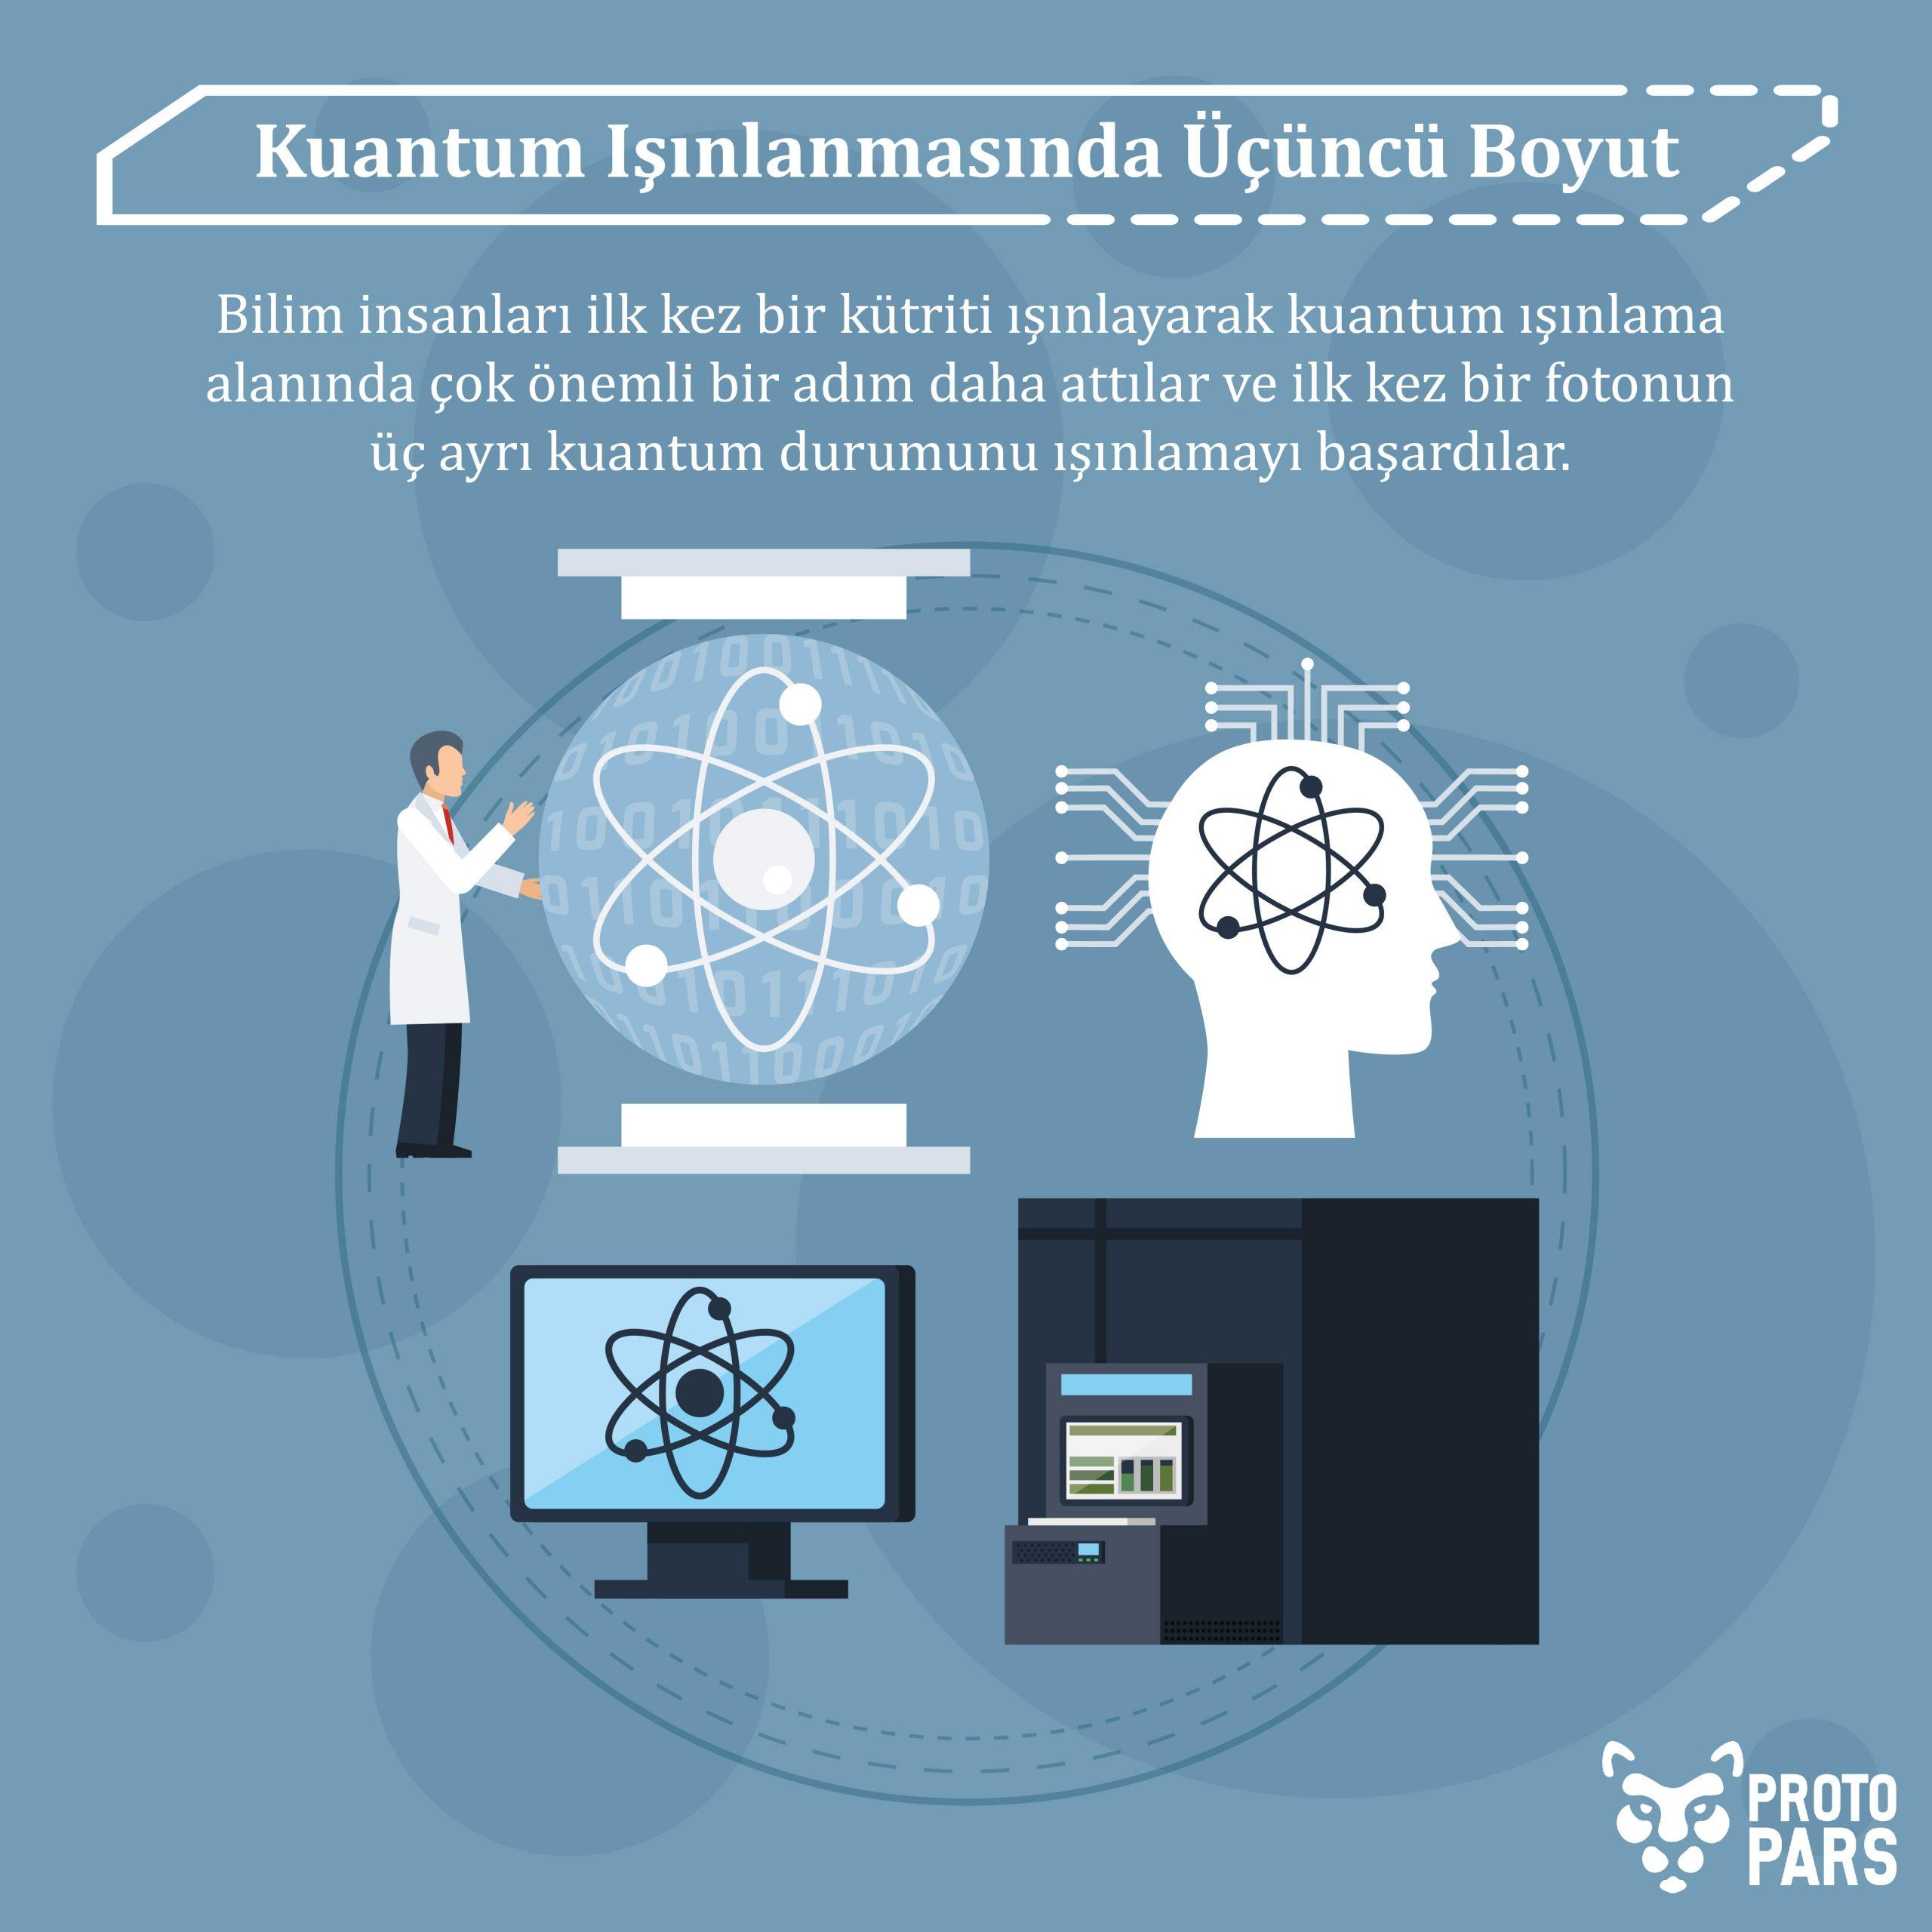 Kuantum Işınlanmasında Üçüncü Boyut